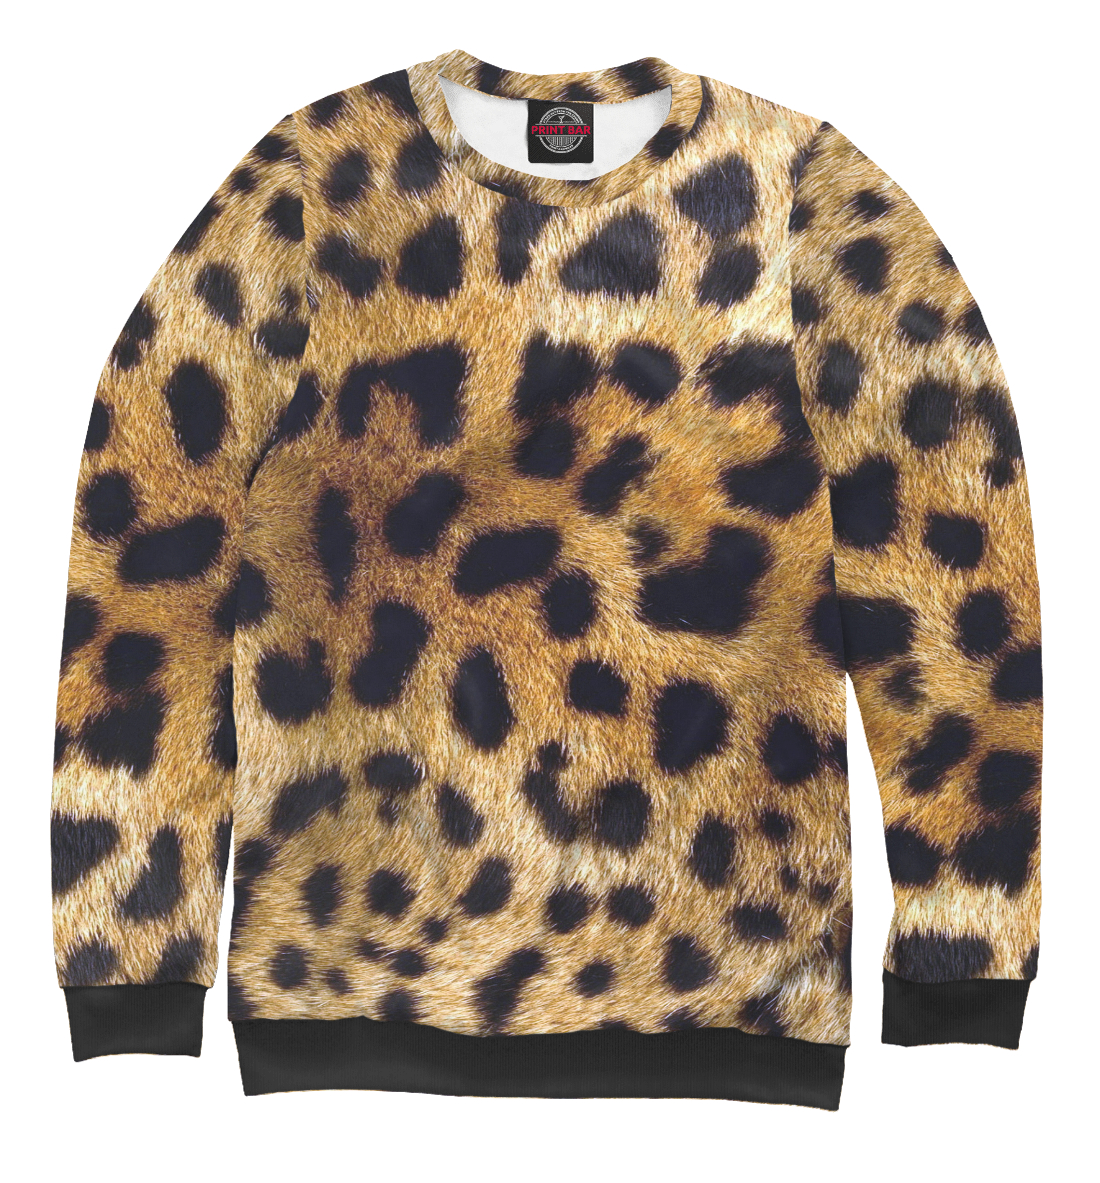 Купить Леопард, Printbar, Свитшоты, OKR-877173-swi-1